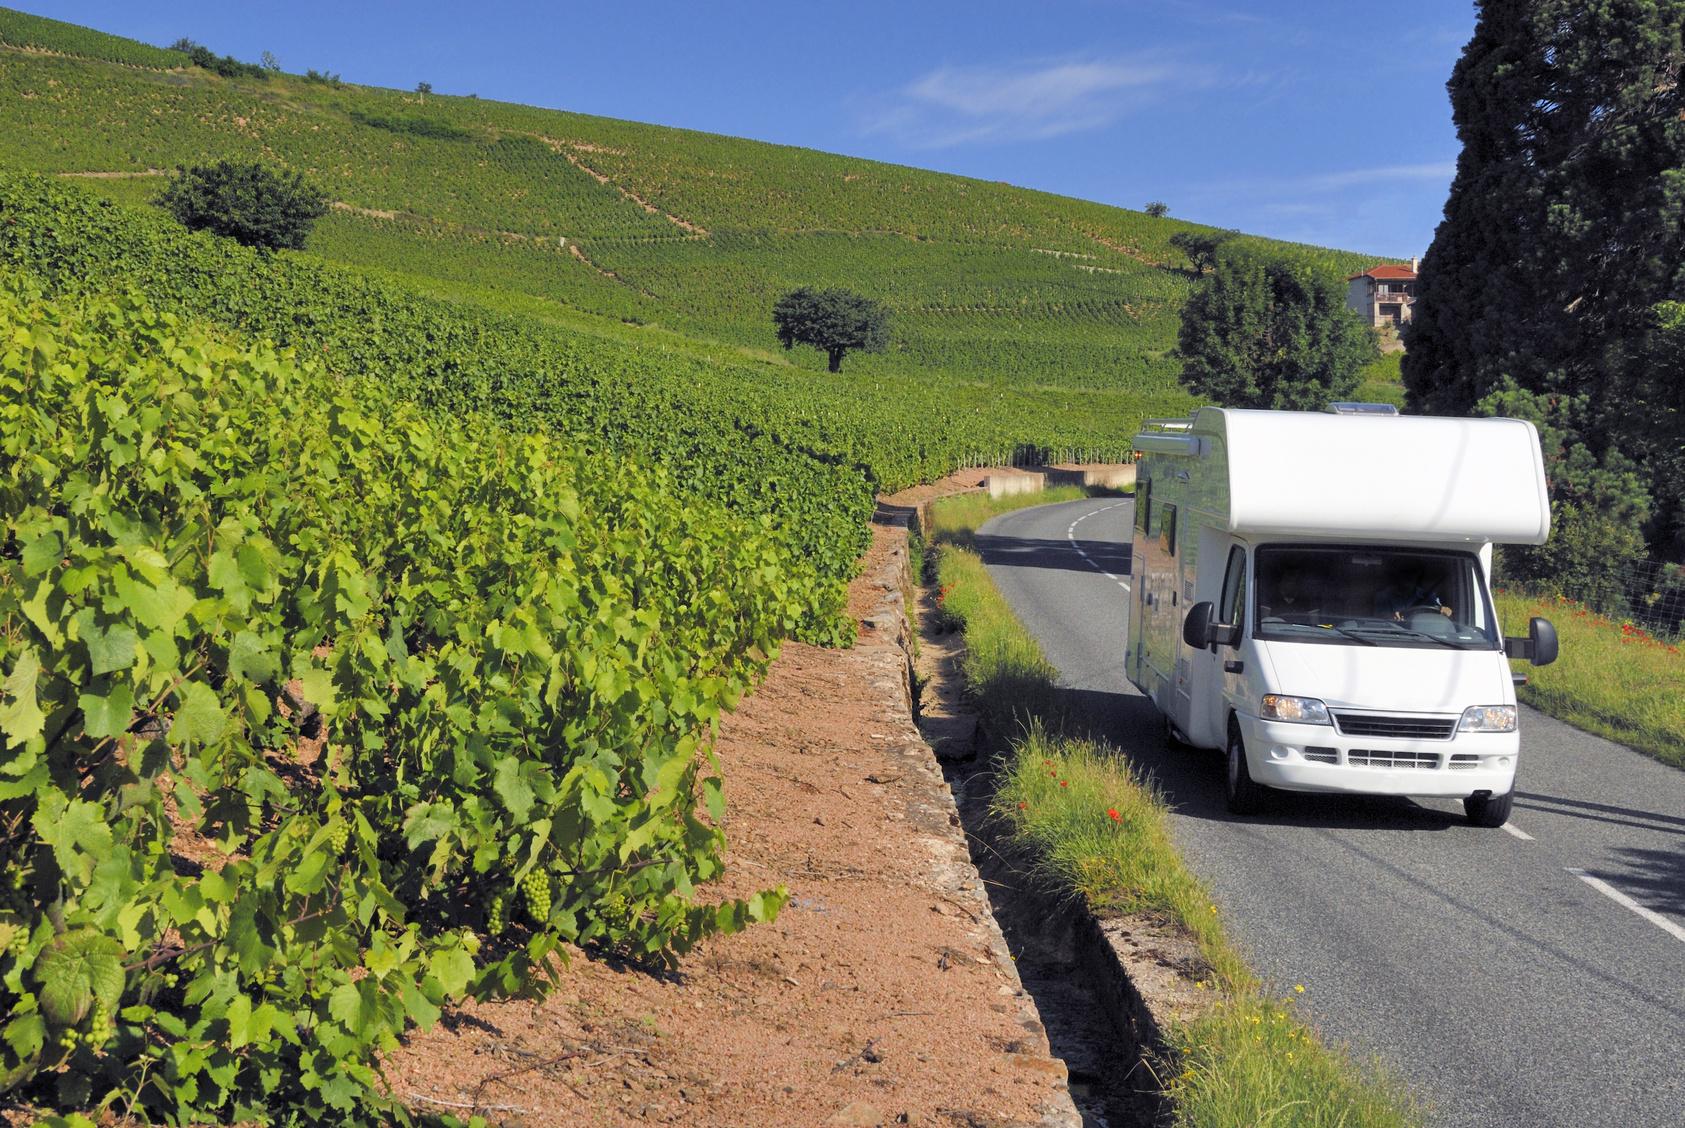 Caravan on its way in France between the vineyards in Beaujolais